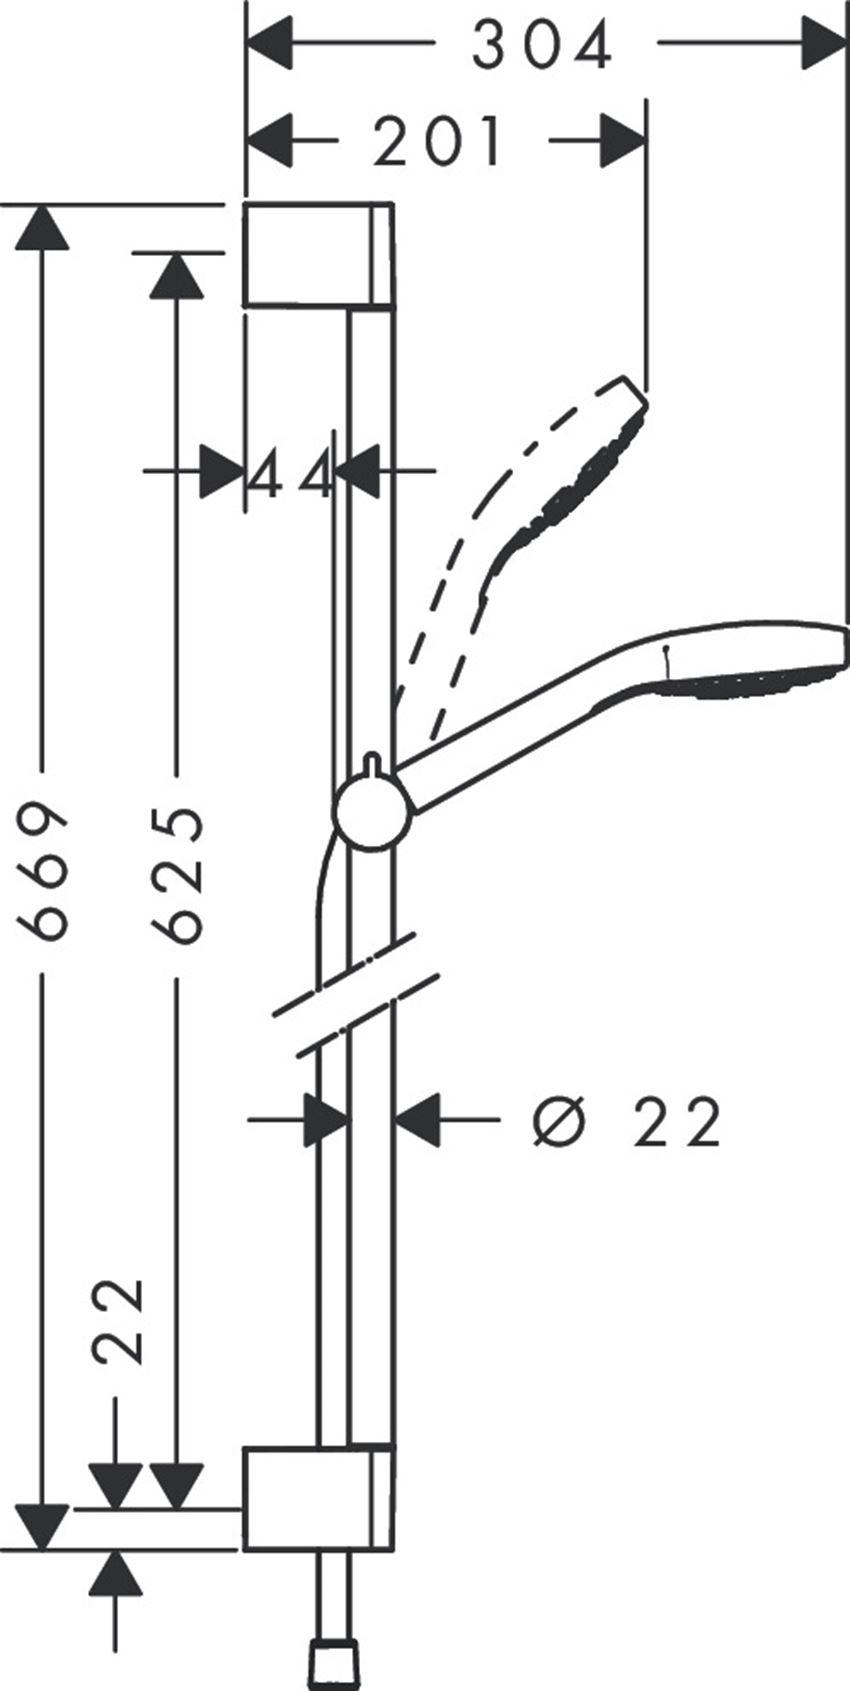 Zestaw prysznicowy 65 cm Hansgrohe Croma Select E Vario rysunek techniczny